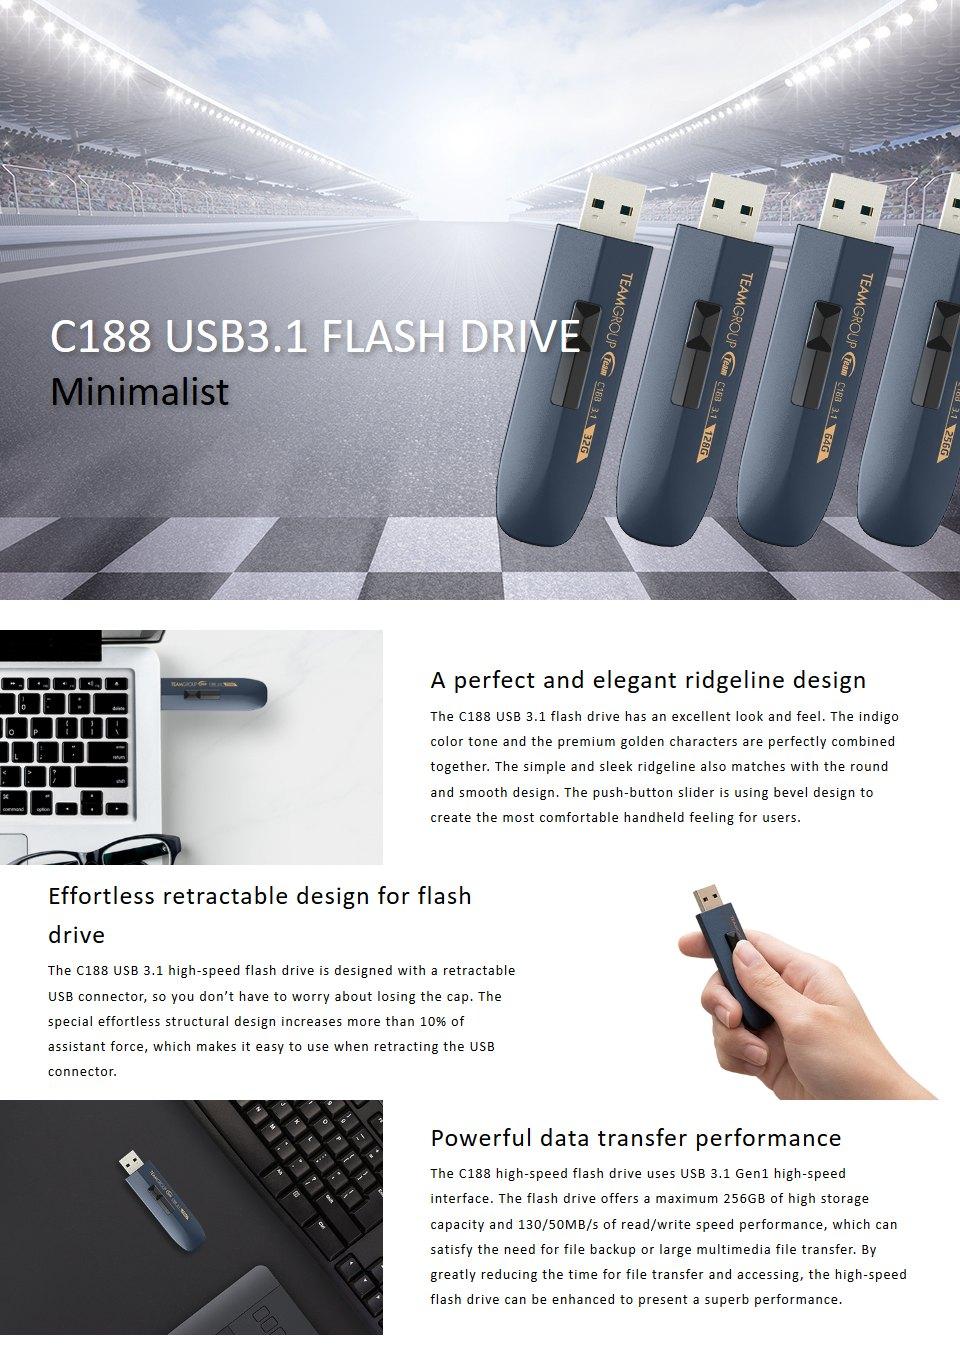 Team Group C188 USB 3.1 Flash Drive 128GB Indigo features